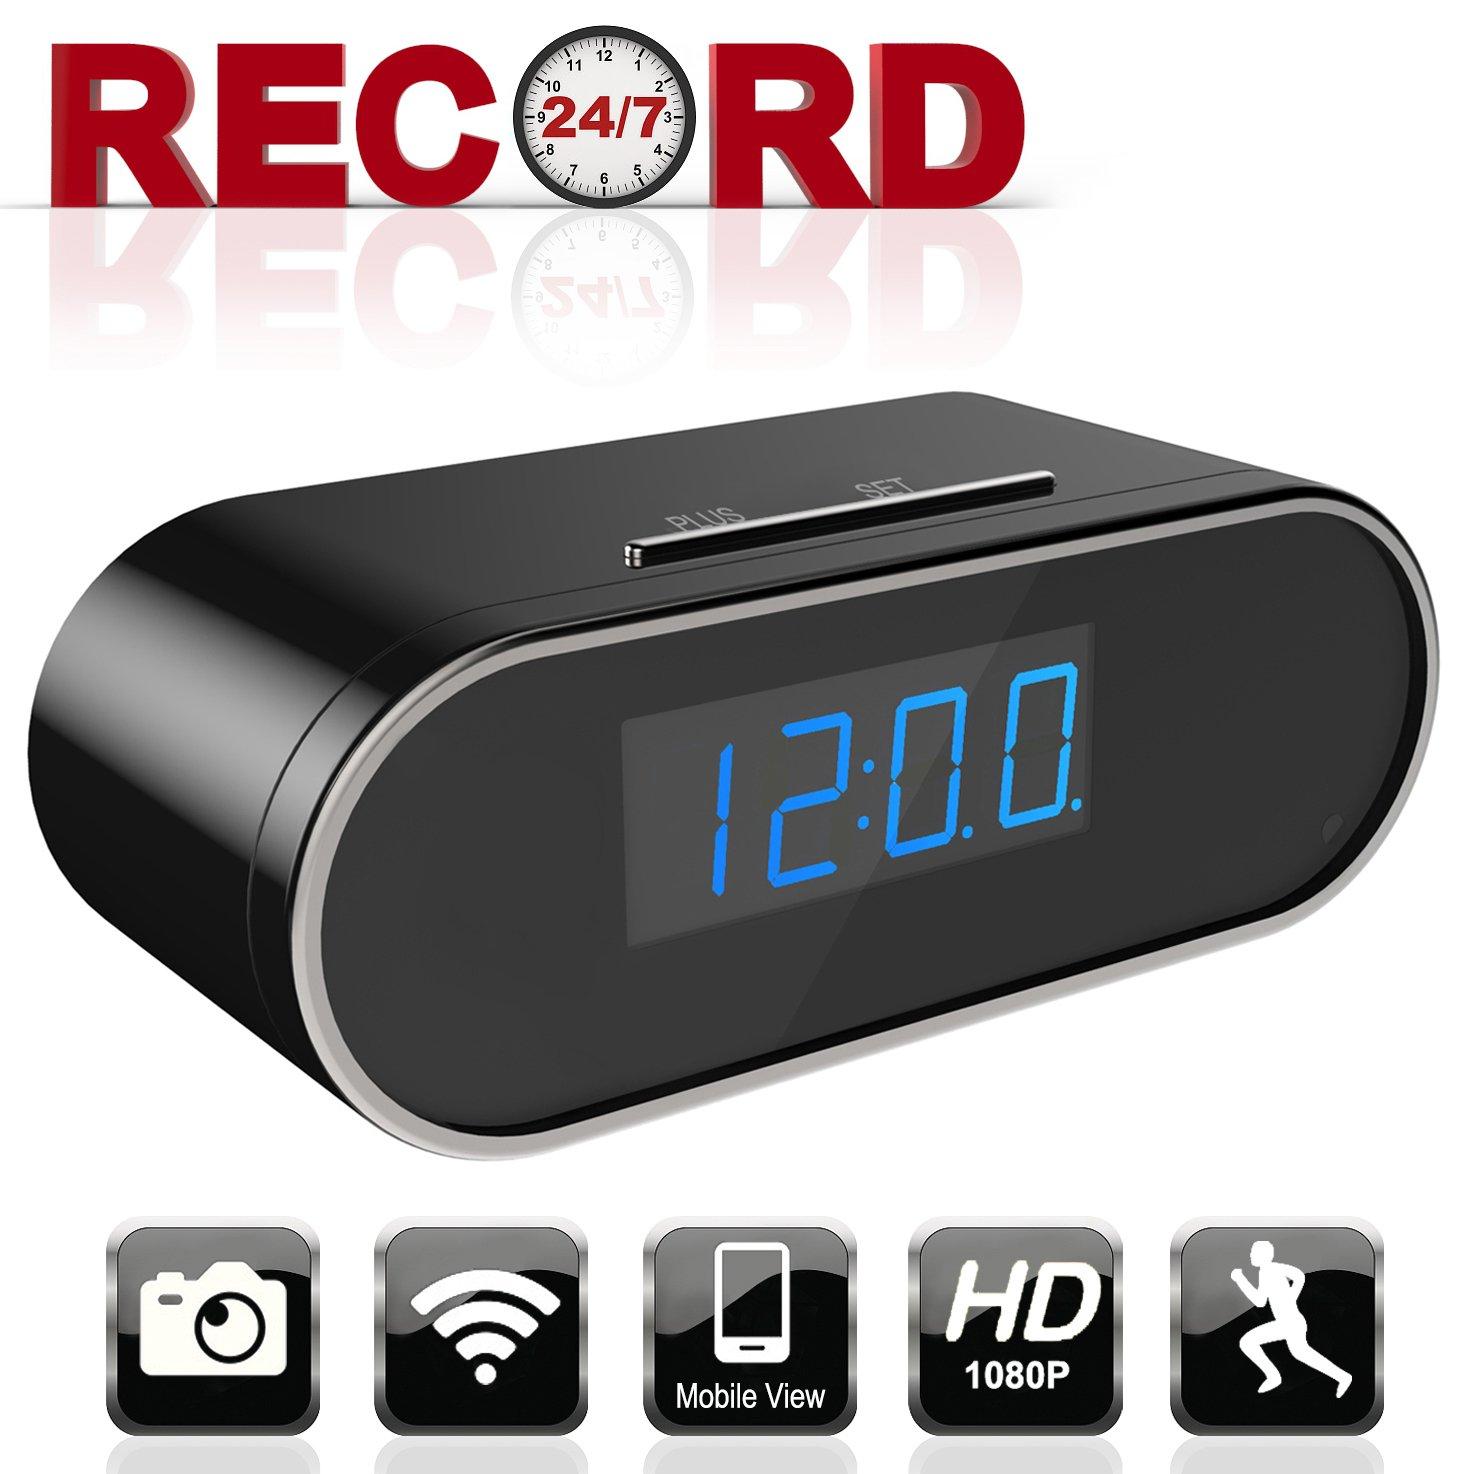 WiFi 1080P Hidden Camera Clock, Spy Camera, Nanny Camera Motion Detection Loop Recording Home Office Security Surveillance